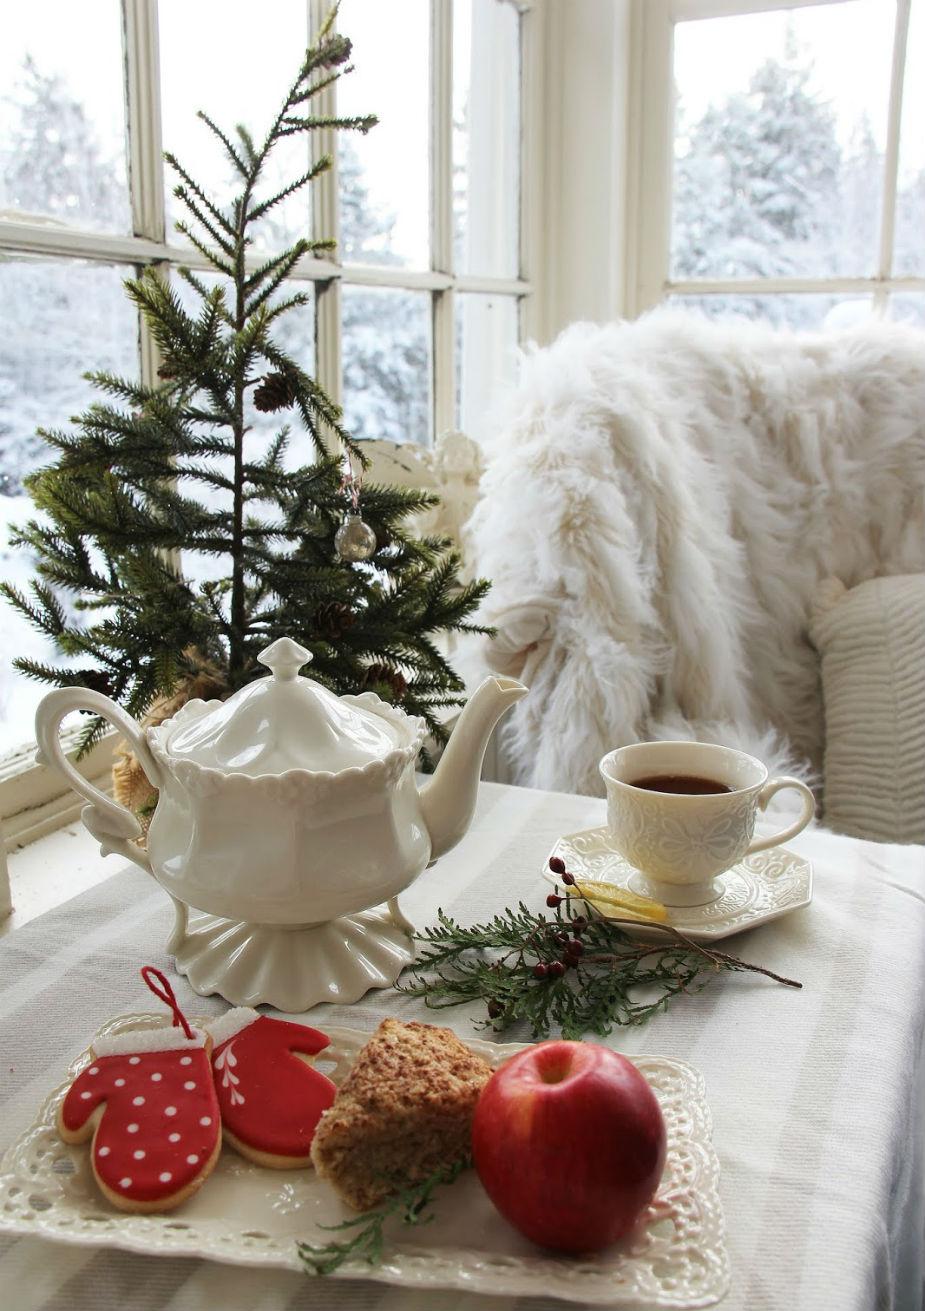 christmas-tea-2-2018-11-16_8560.jpg